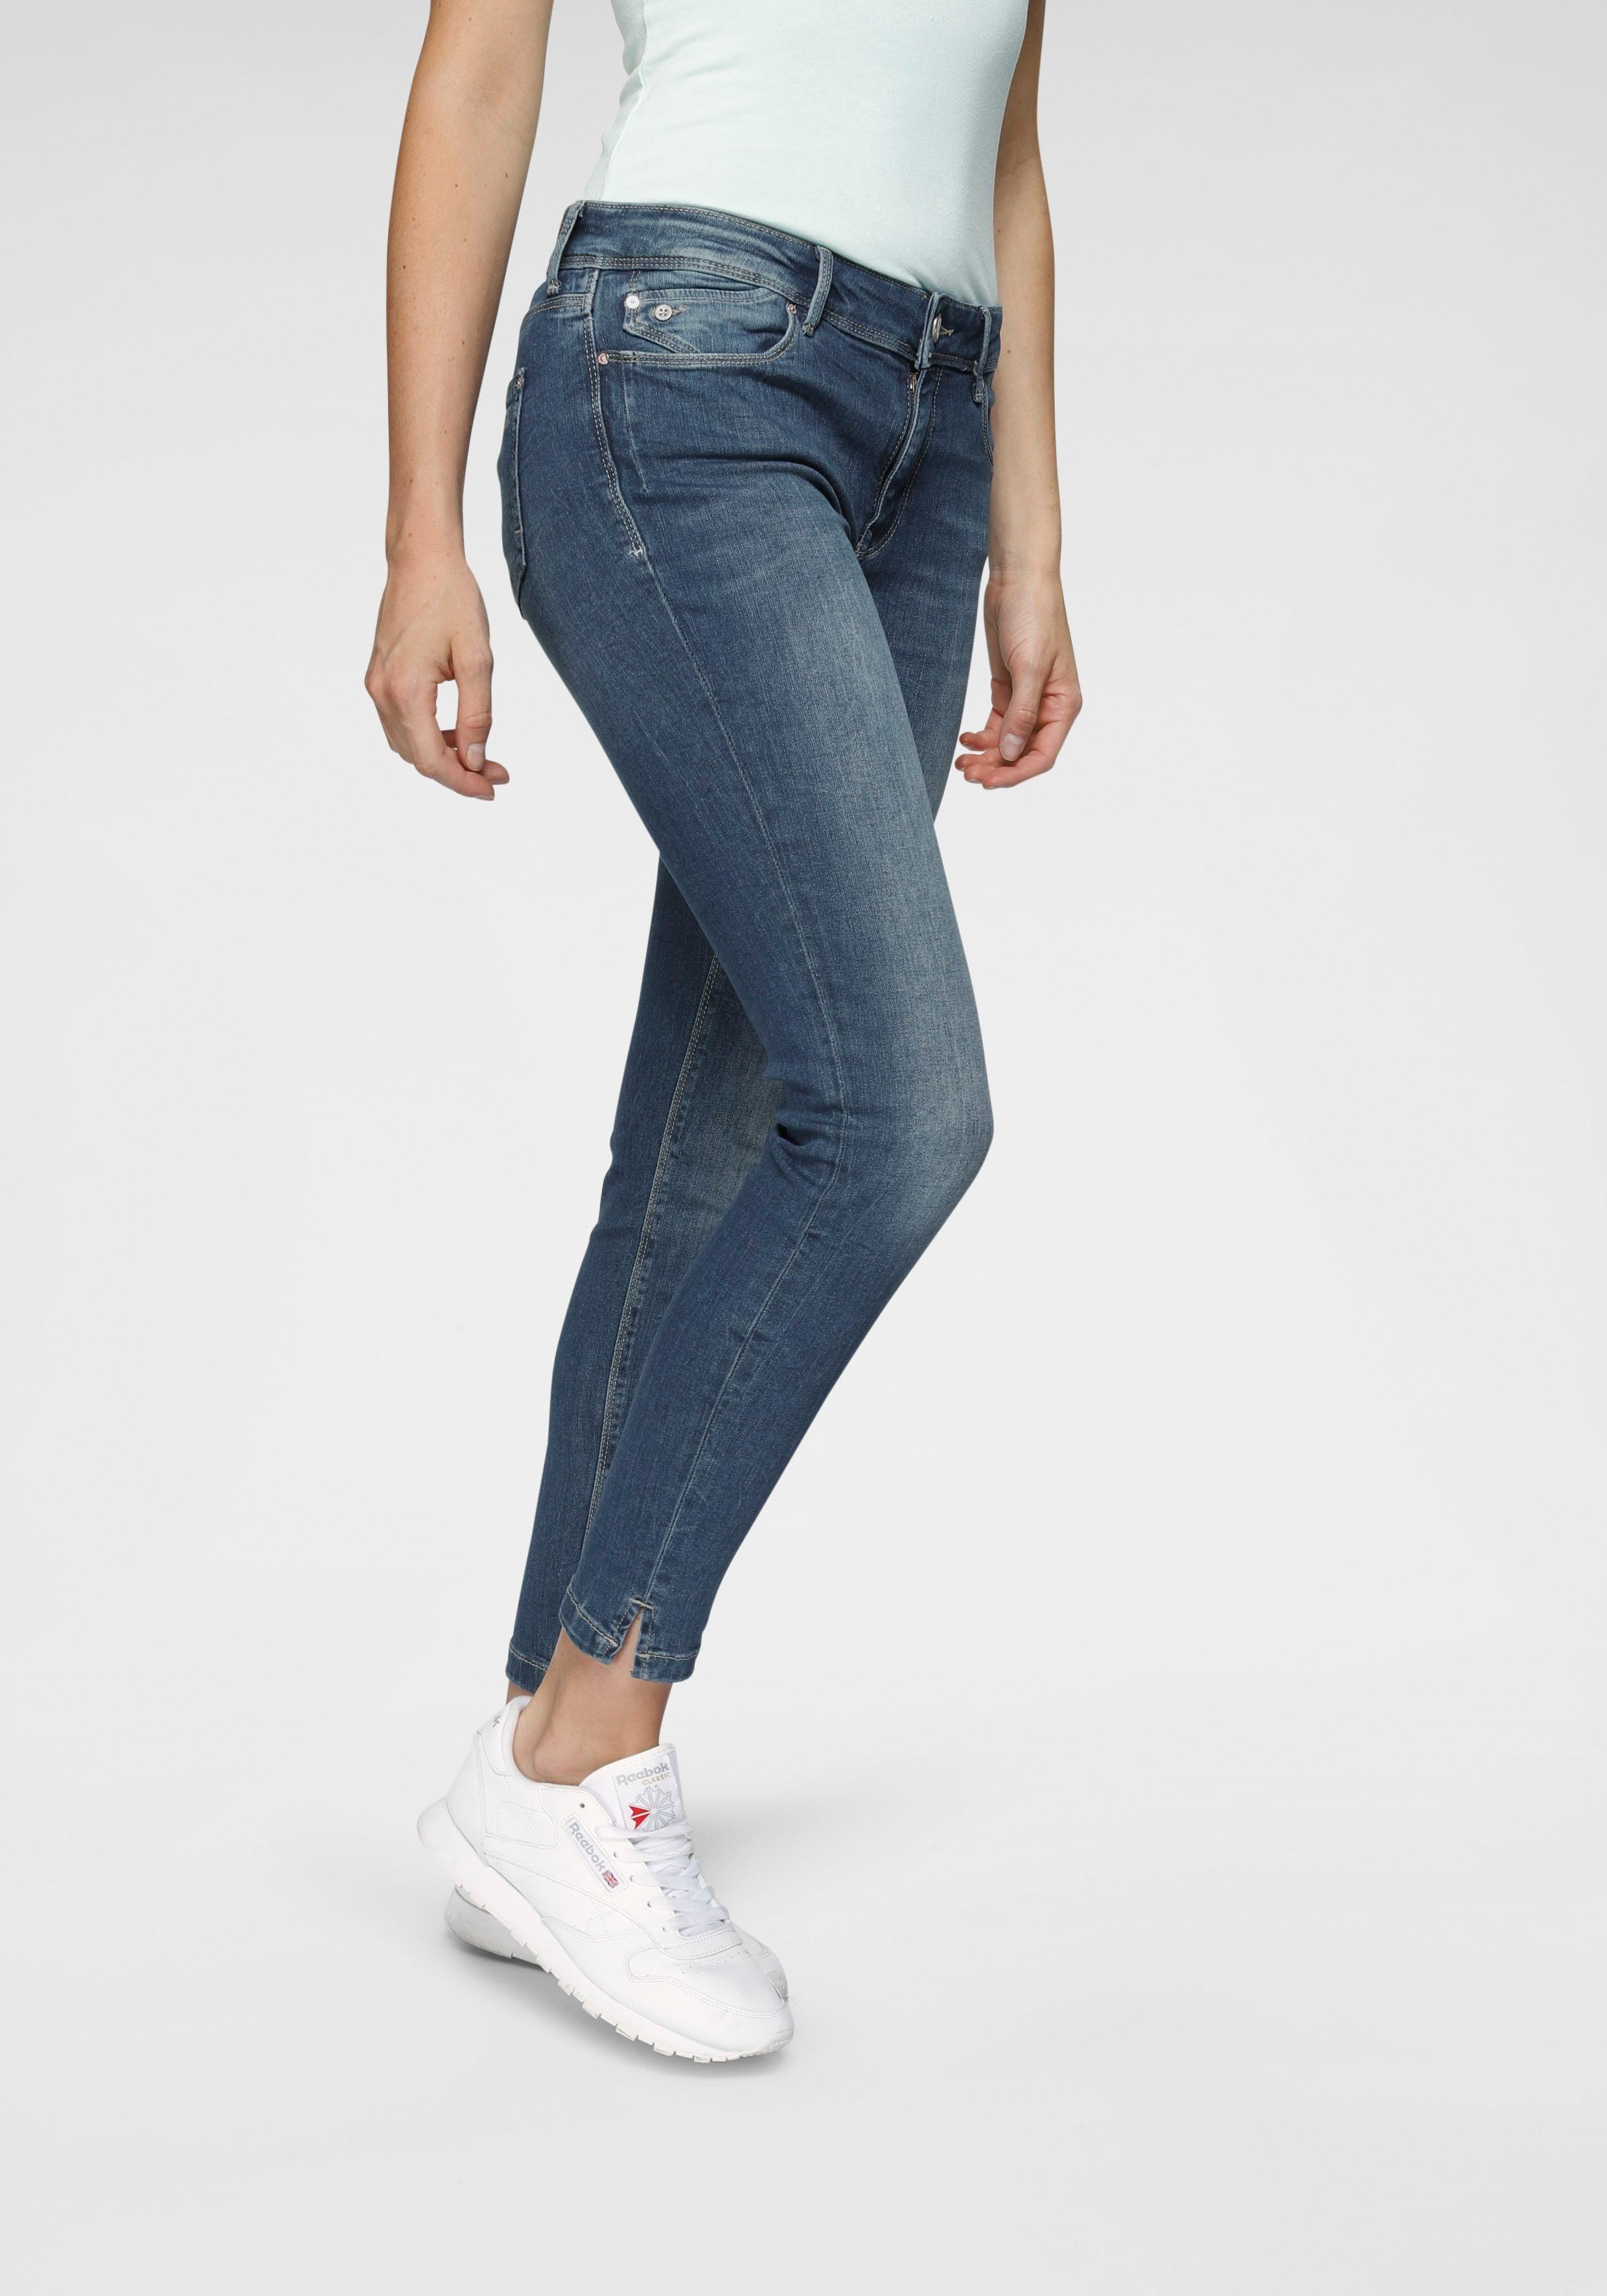 Mavi skinny fit jeans  ADRIANA ANKLE nu online bestellen  mid-blue